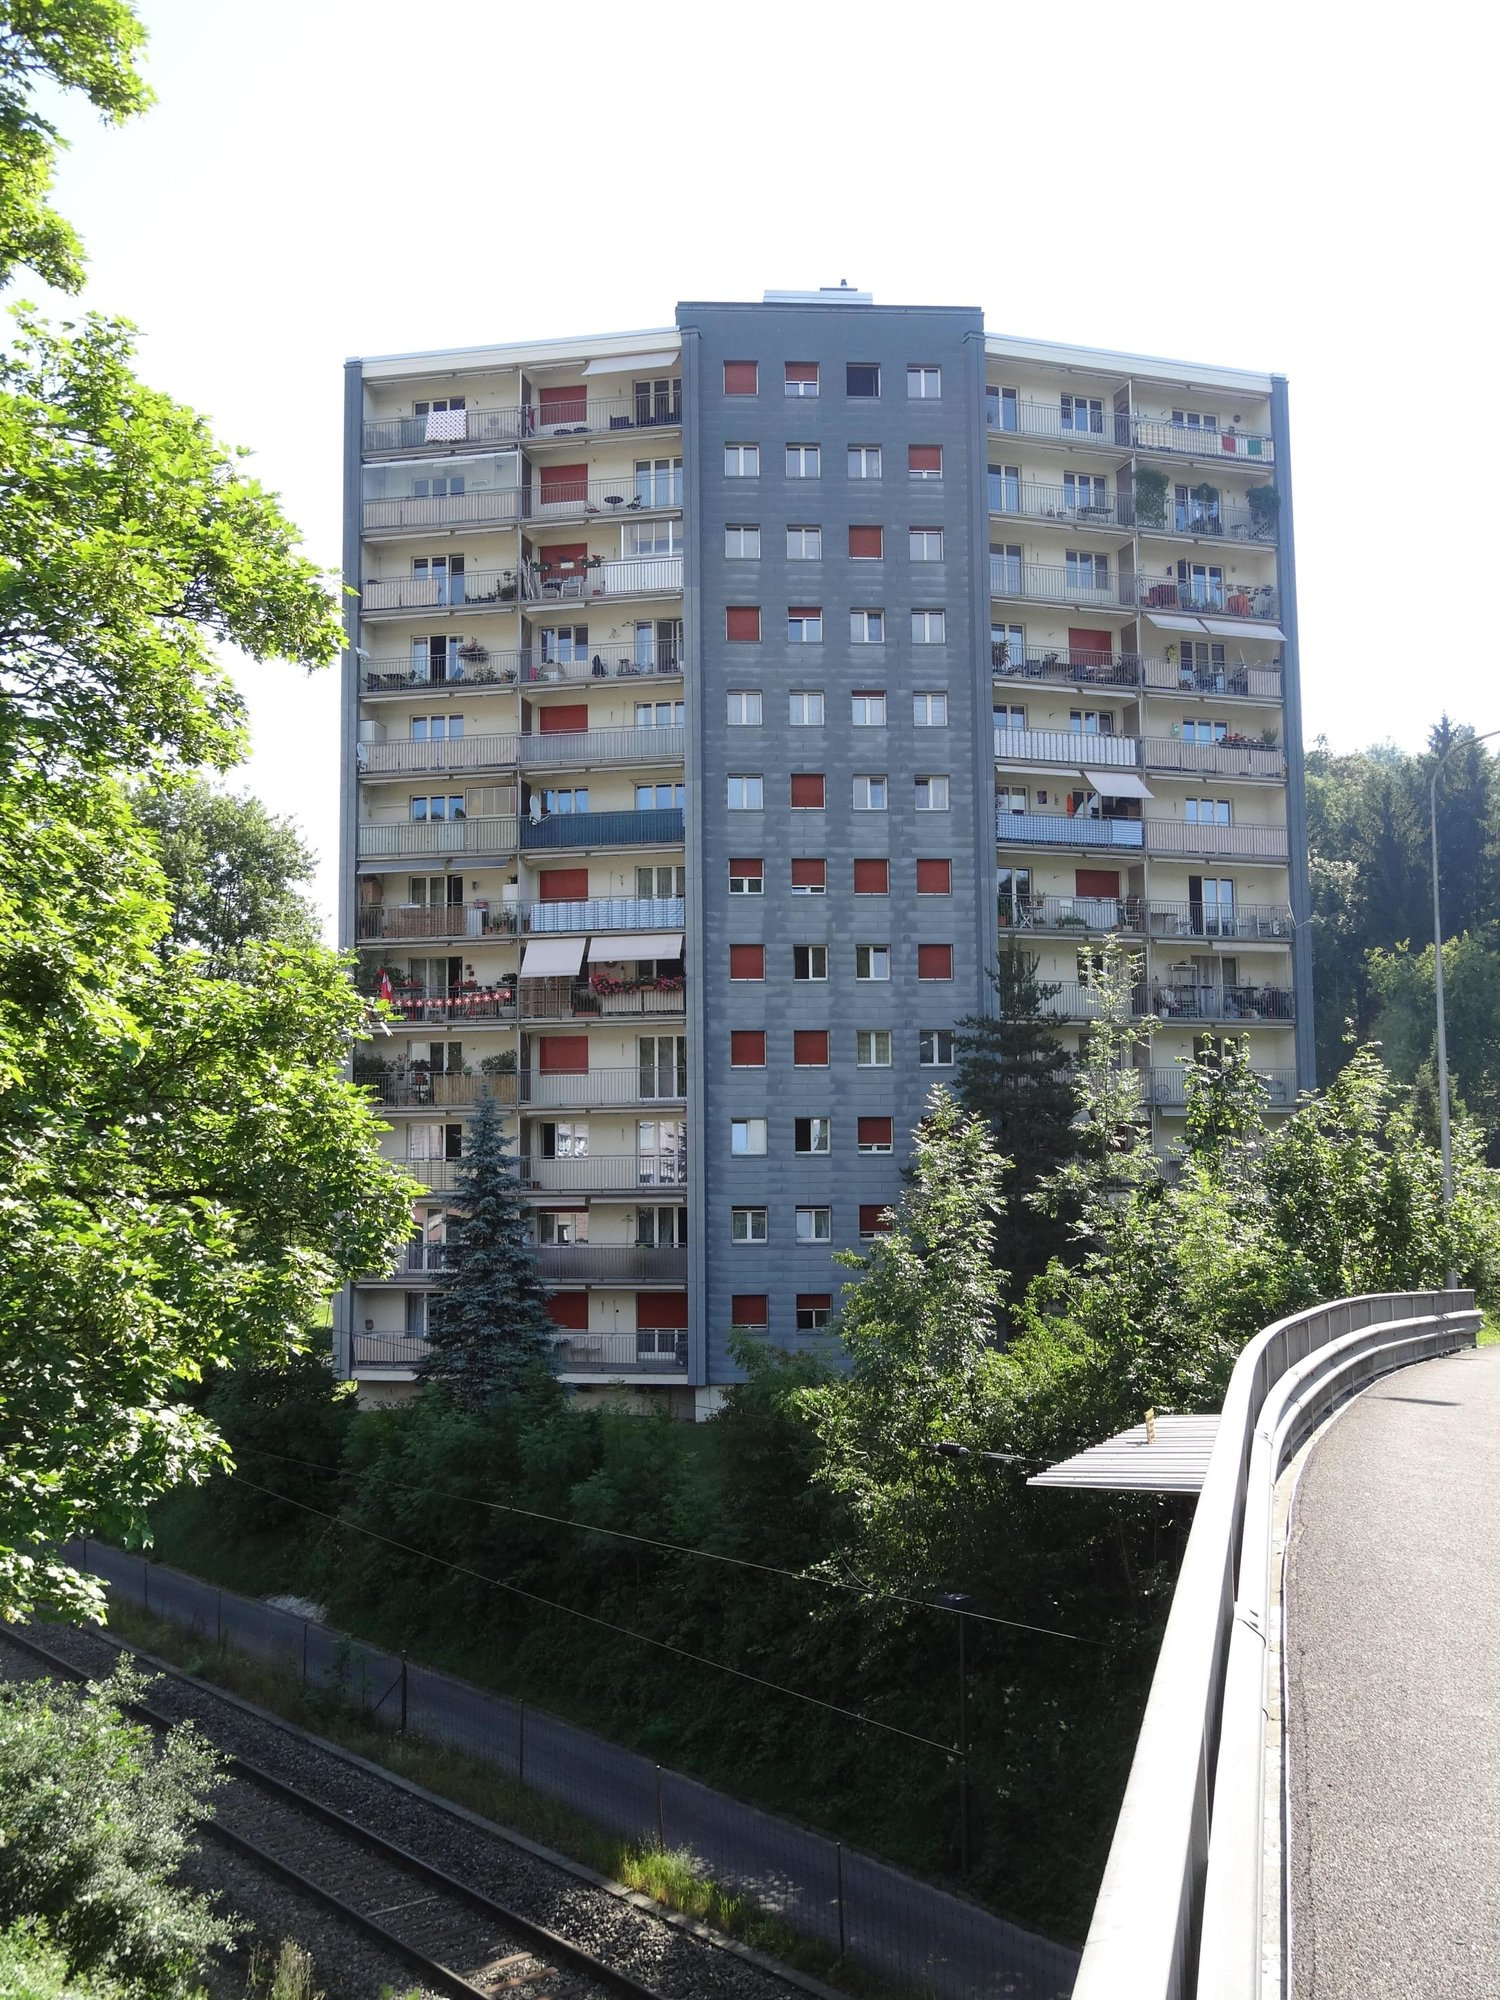 Mellingerstrasse 176